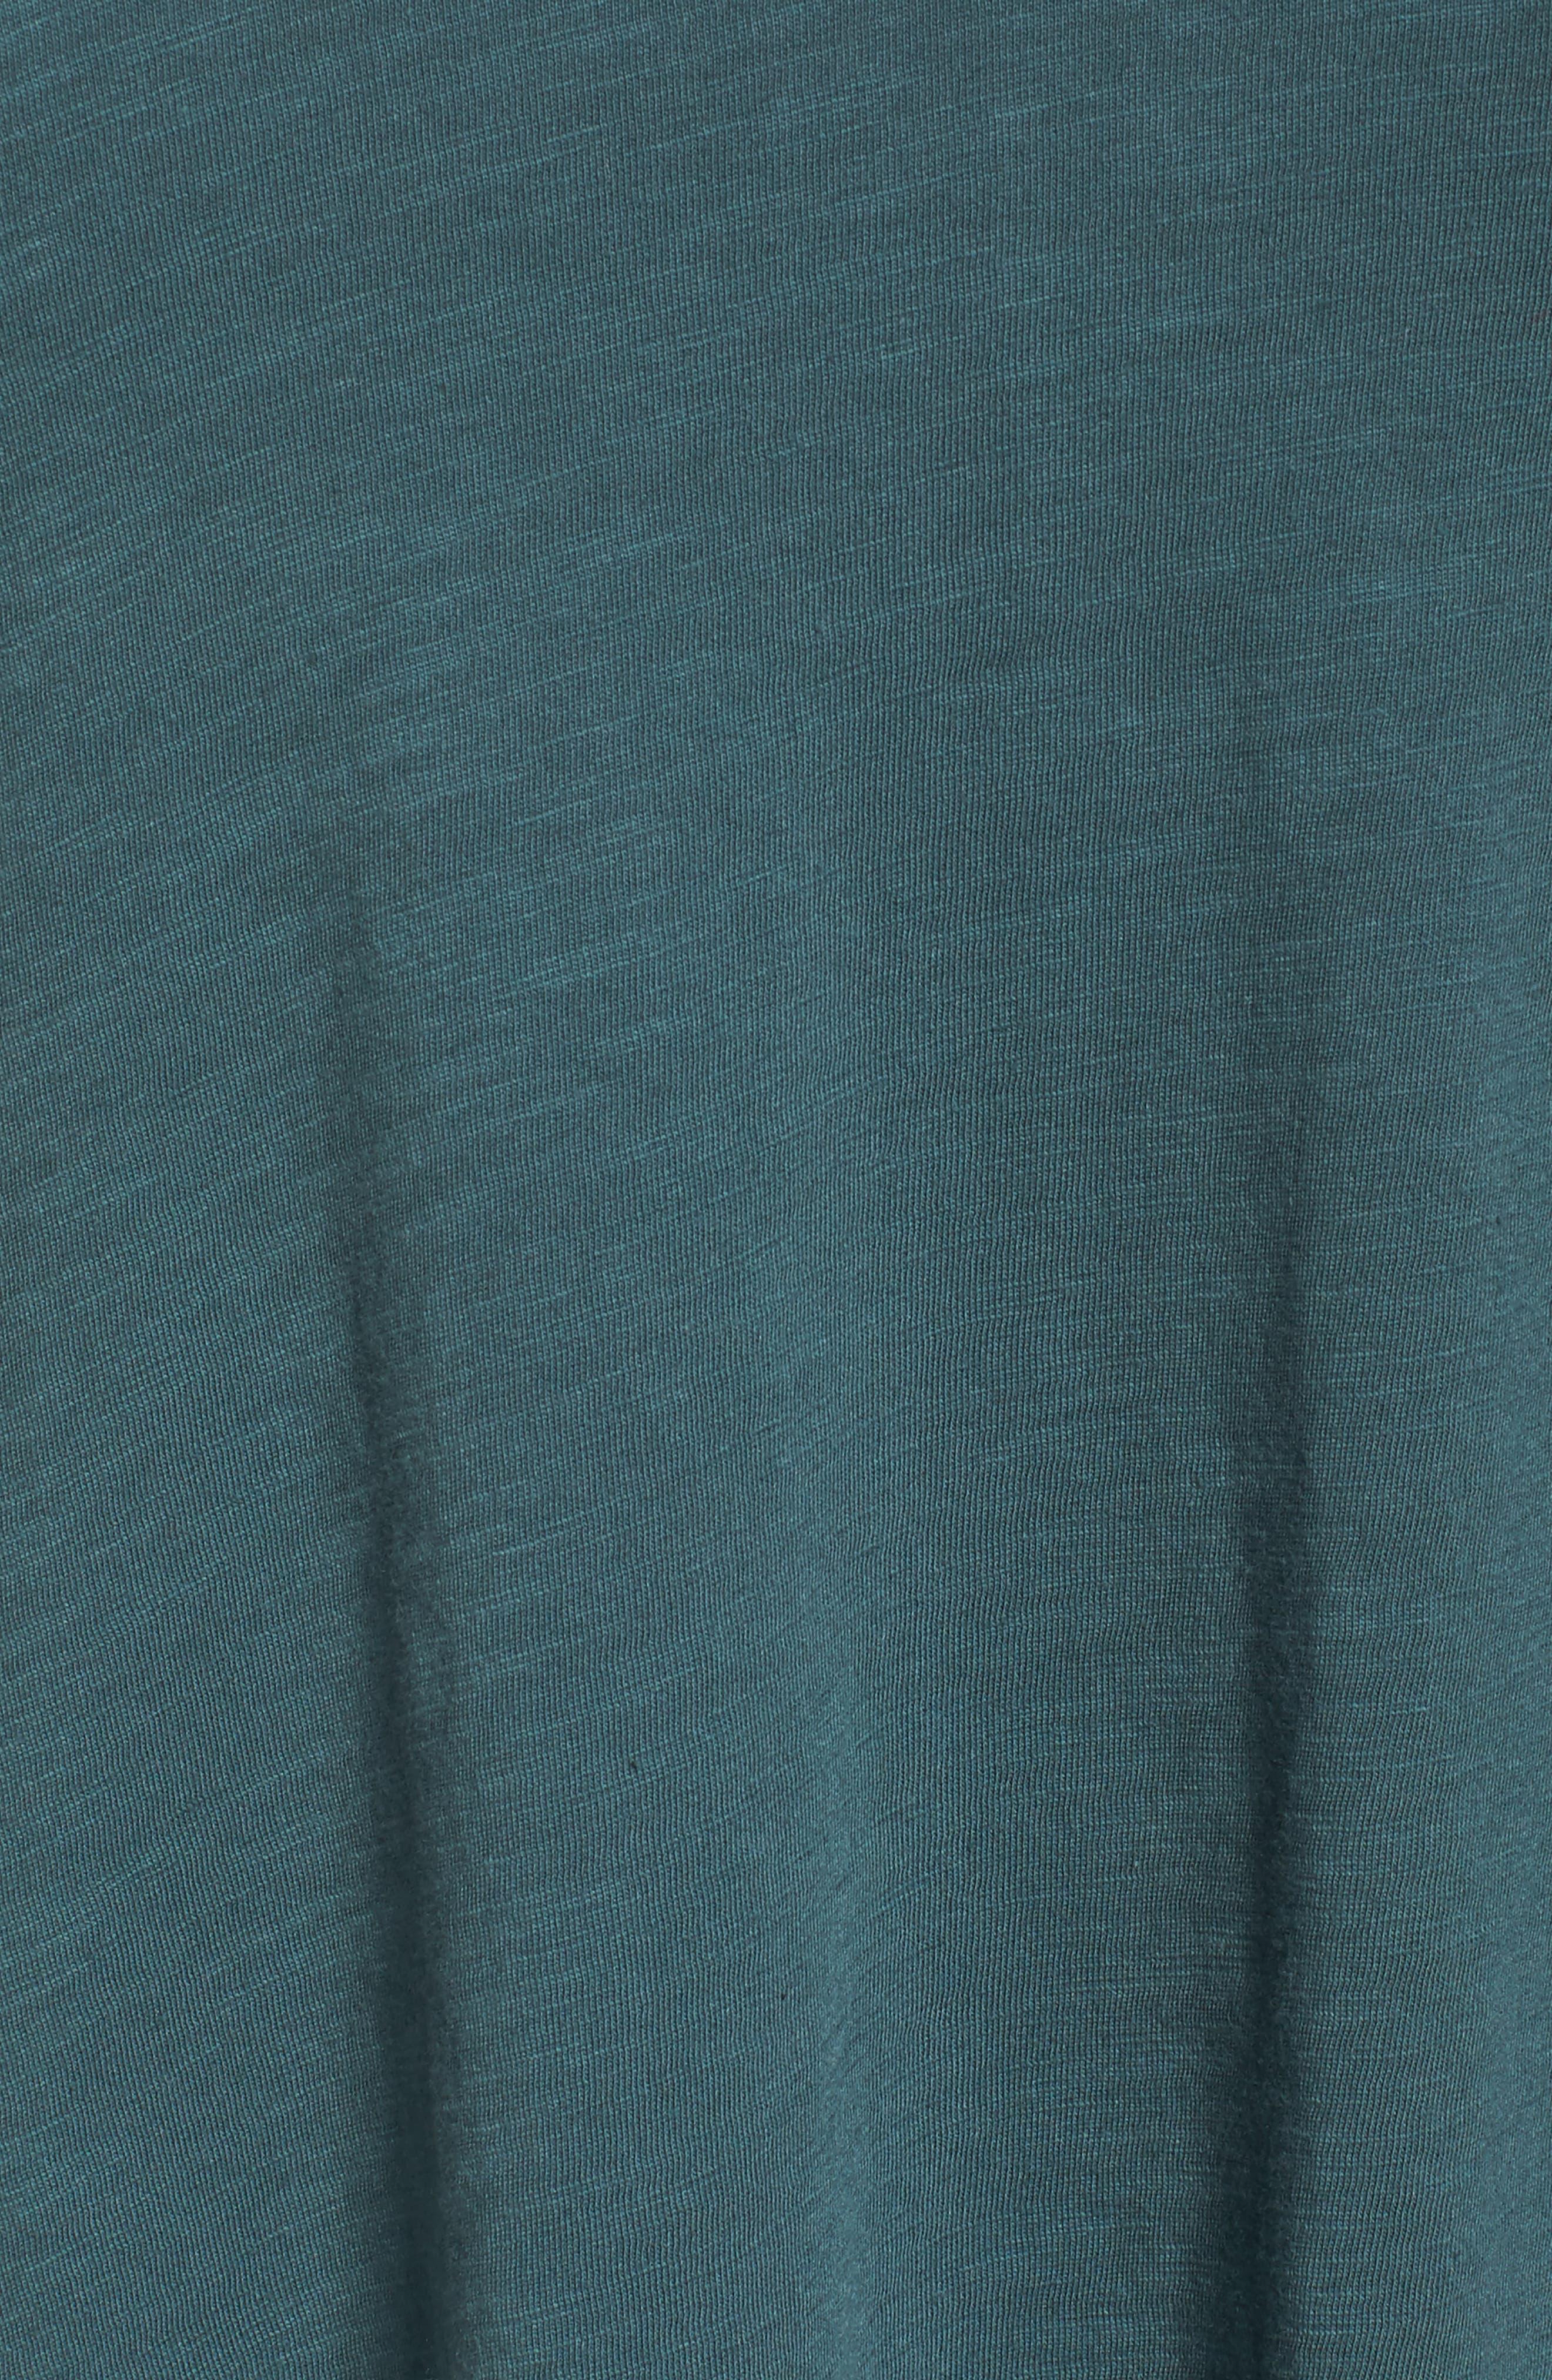 Organic Cotton V-Neck Top,                             Alternate thumbnail 5, color,                             Dragonfly